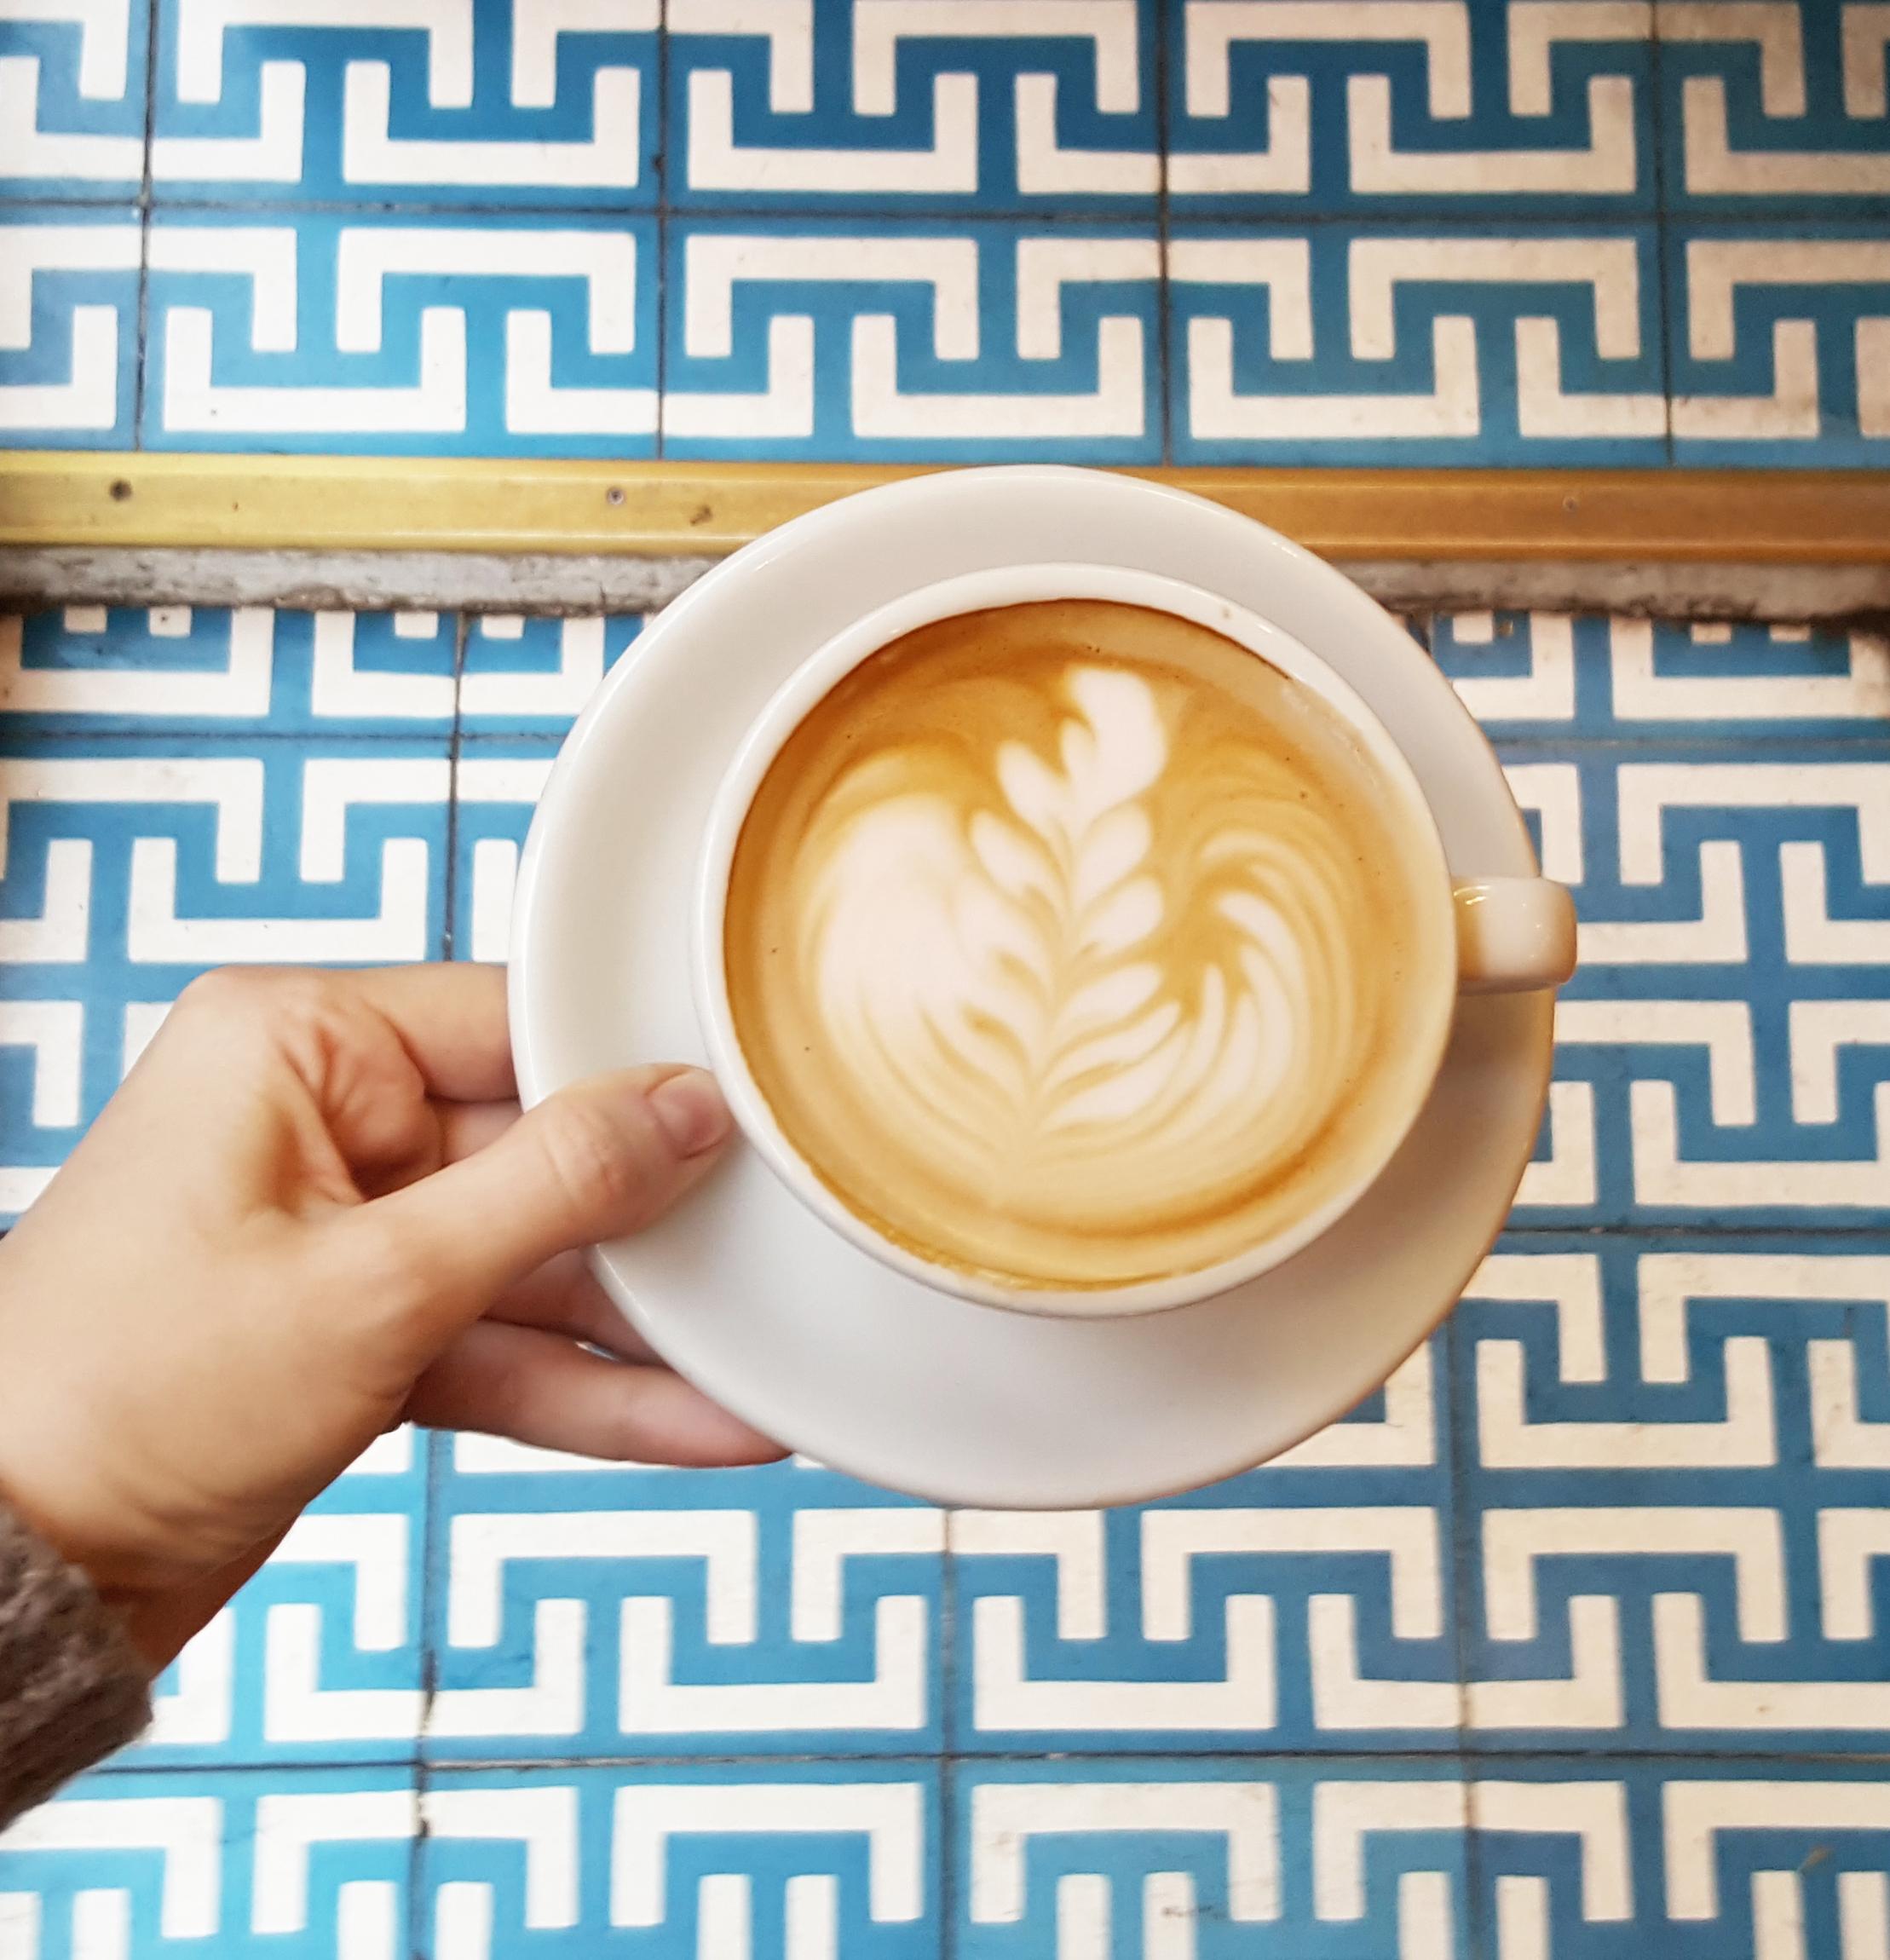 Ob-La-Di - top meilleurs cafés à paris